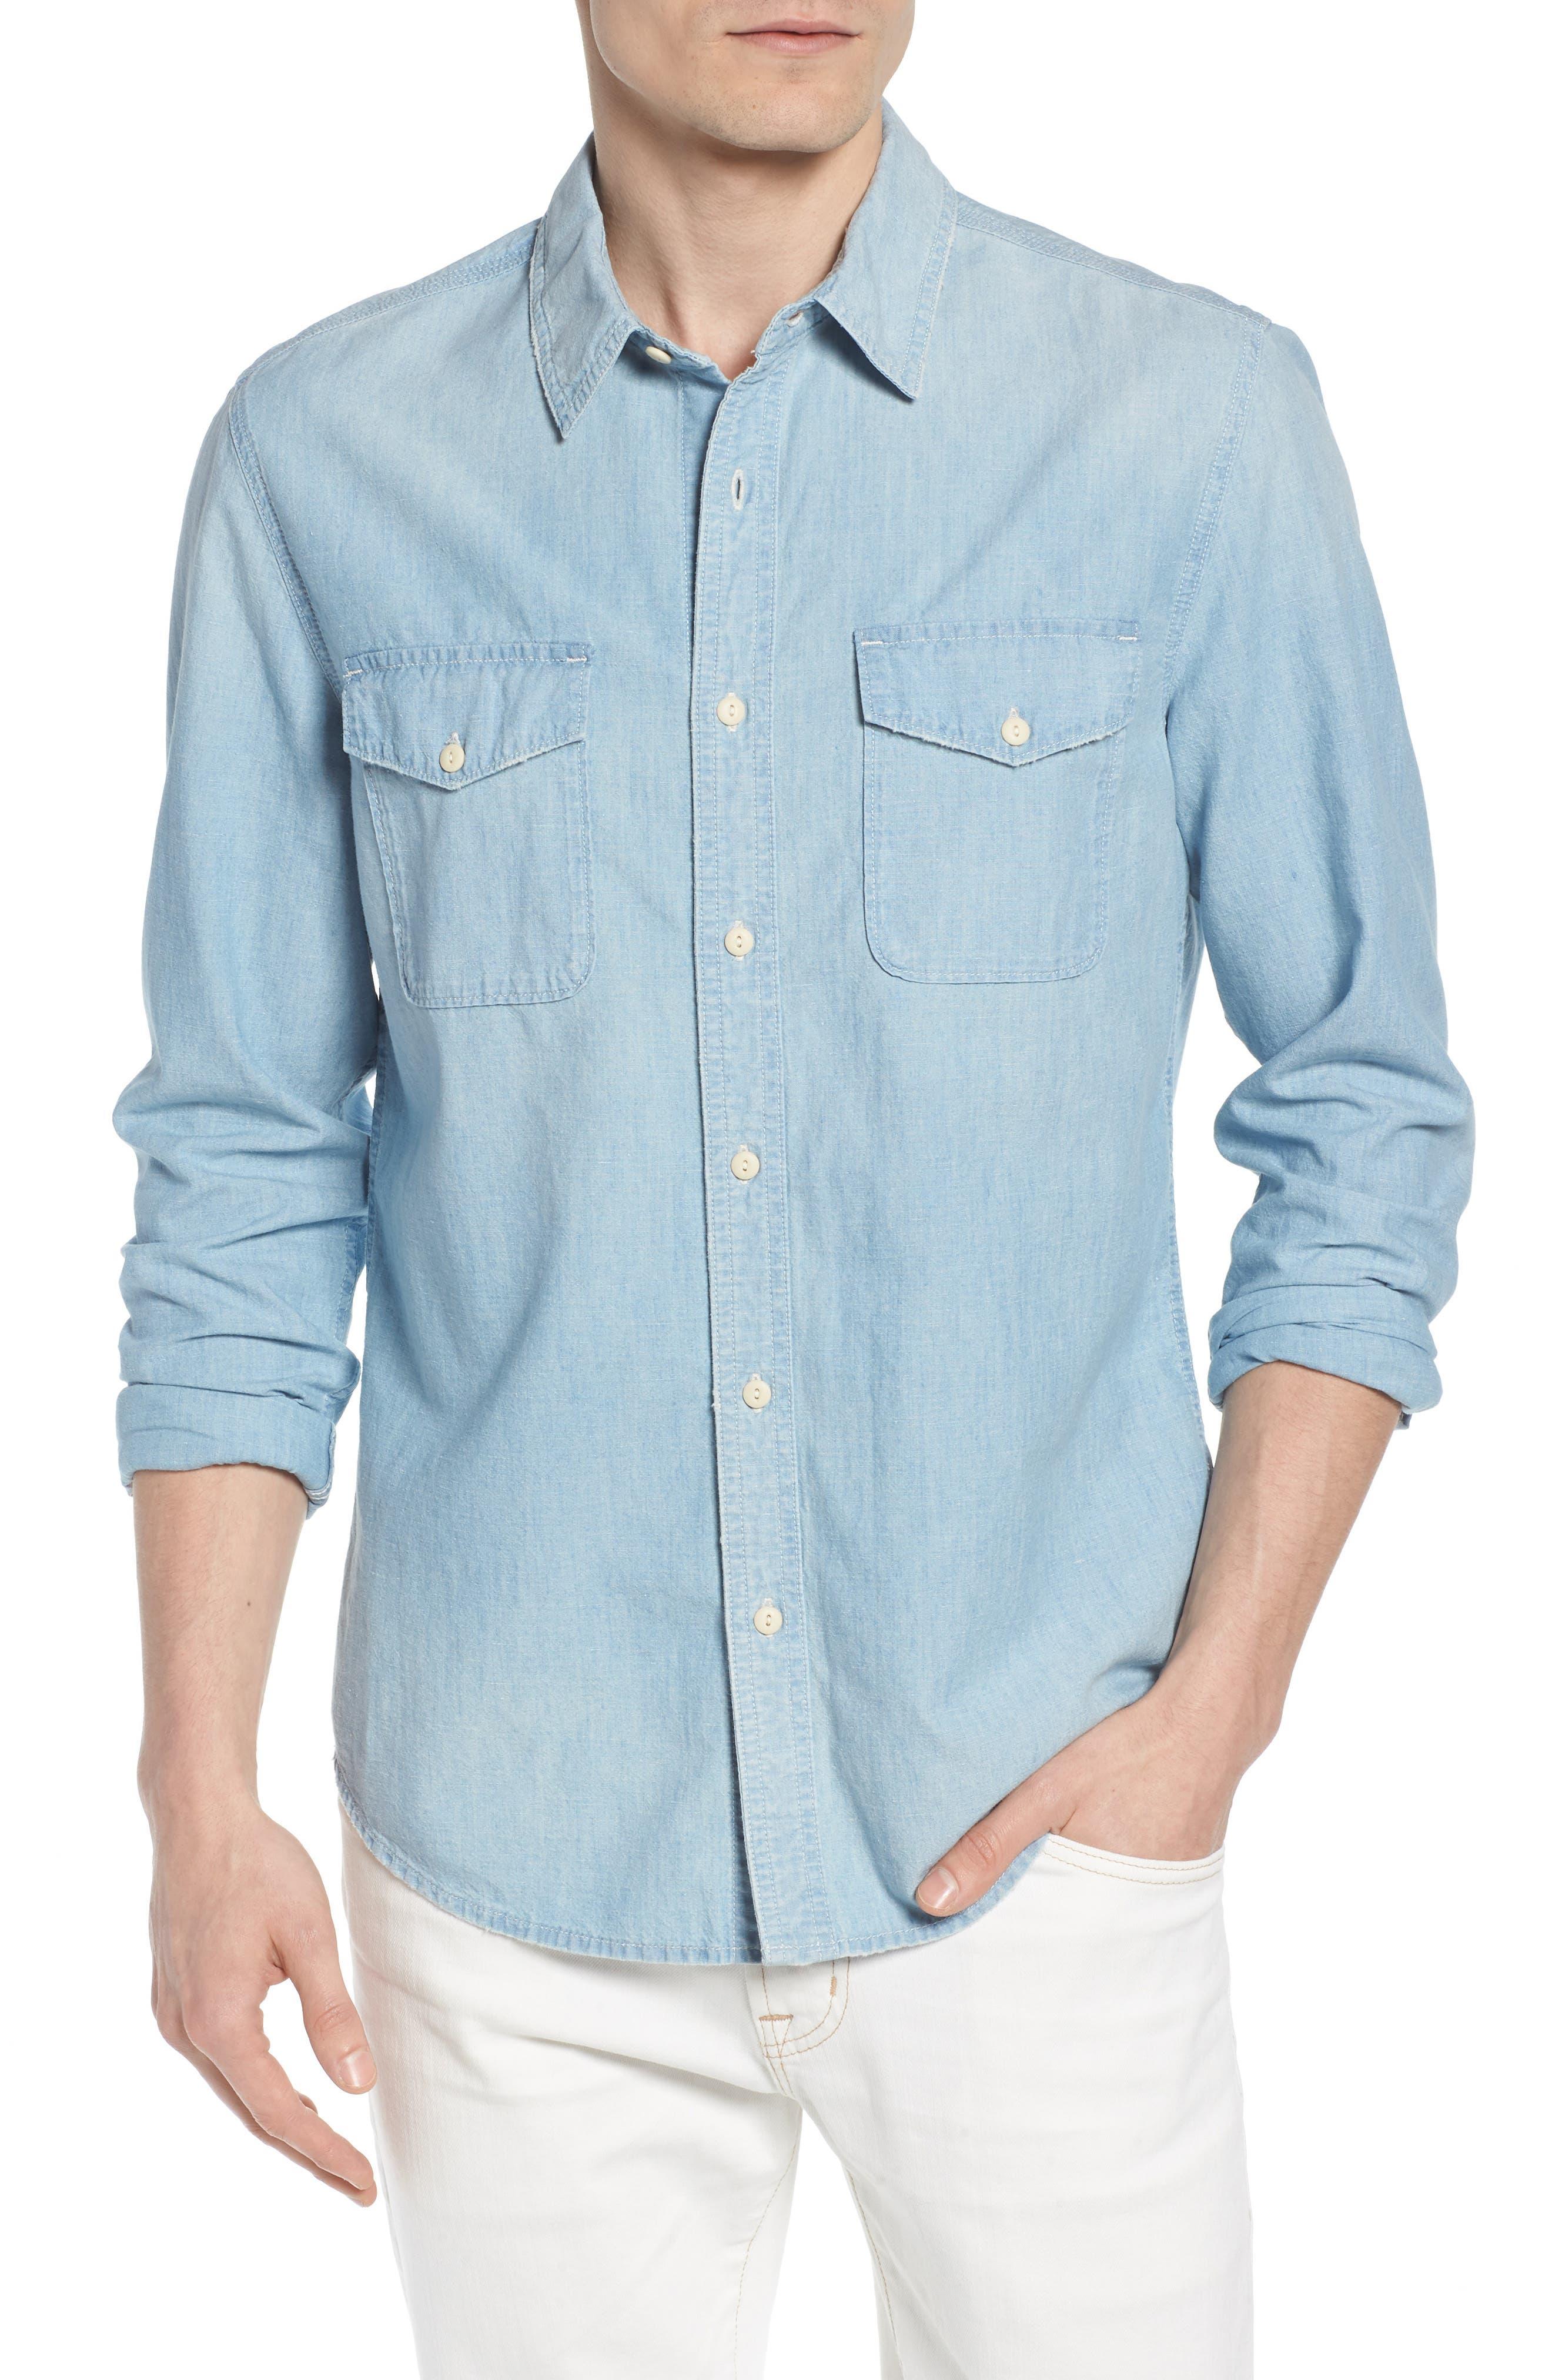 Benning Regular Fit Sport Shirt,                         Main,                         color, Roadstead